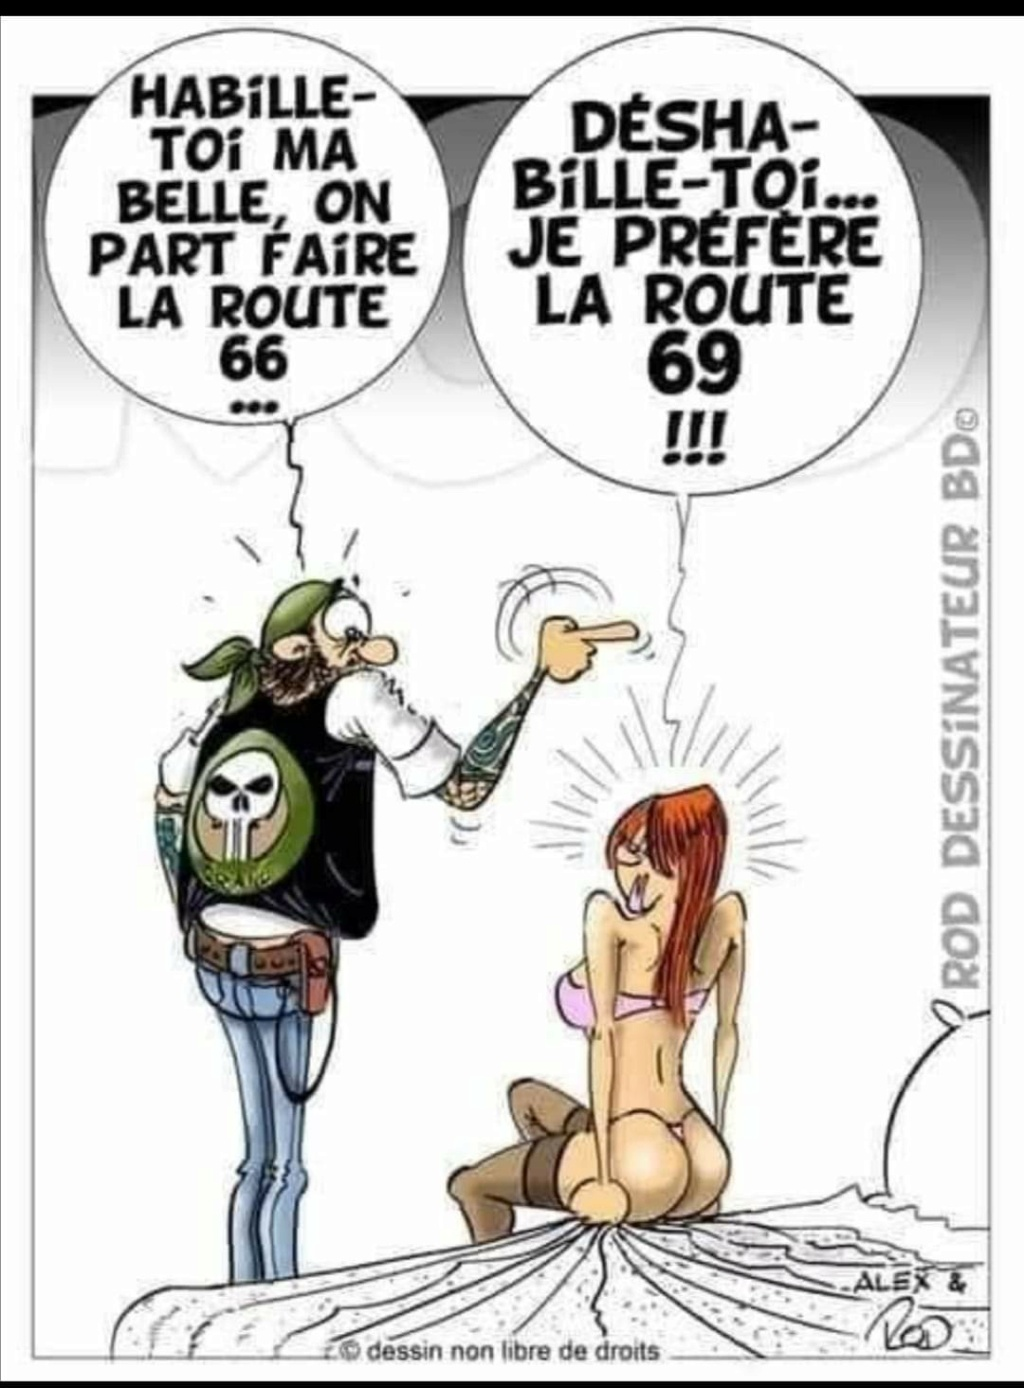 Humour en image du Forum Passion-Harley  ... - Page 14 73cfa310